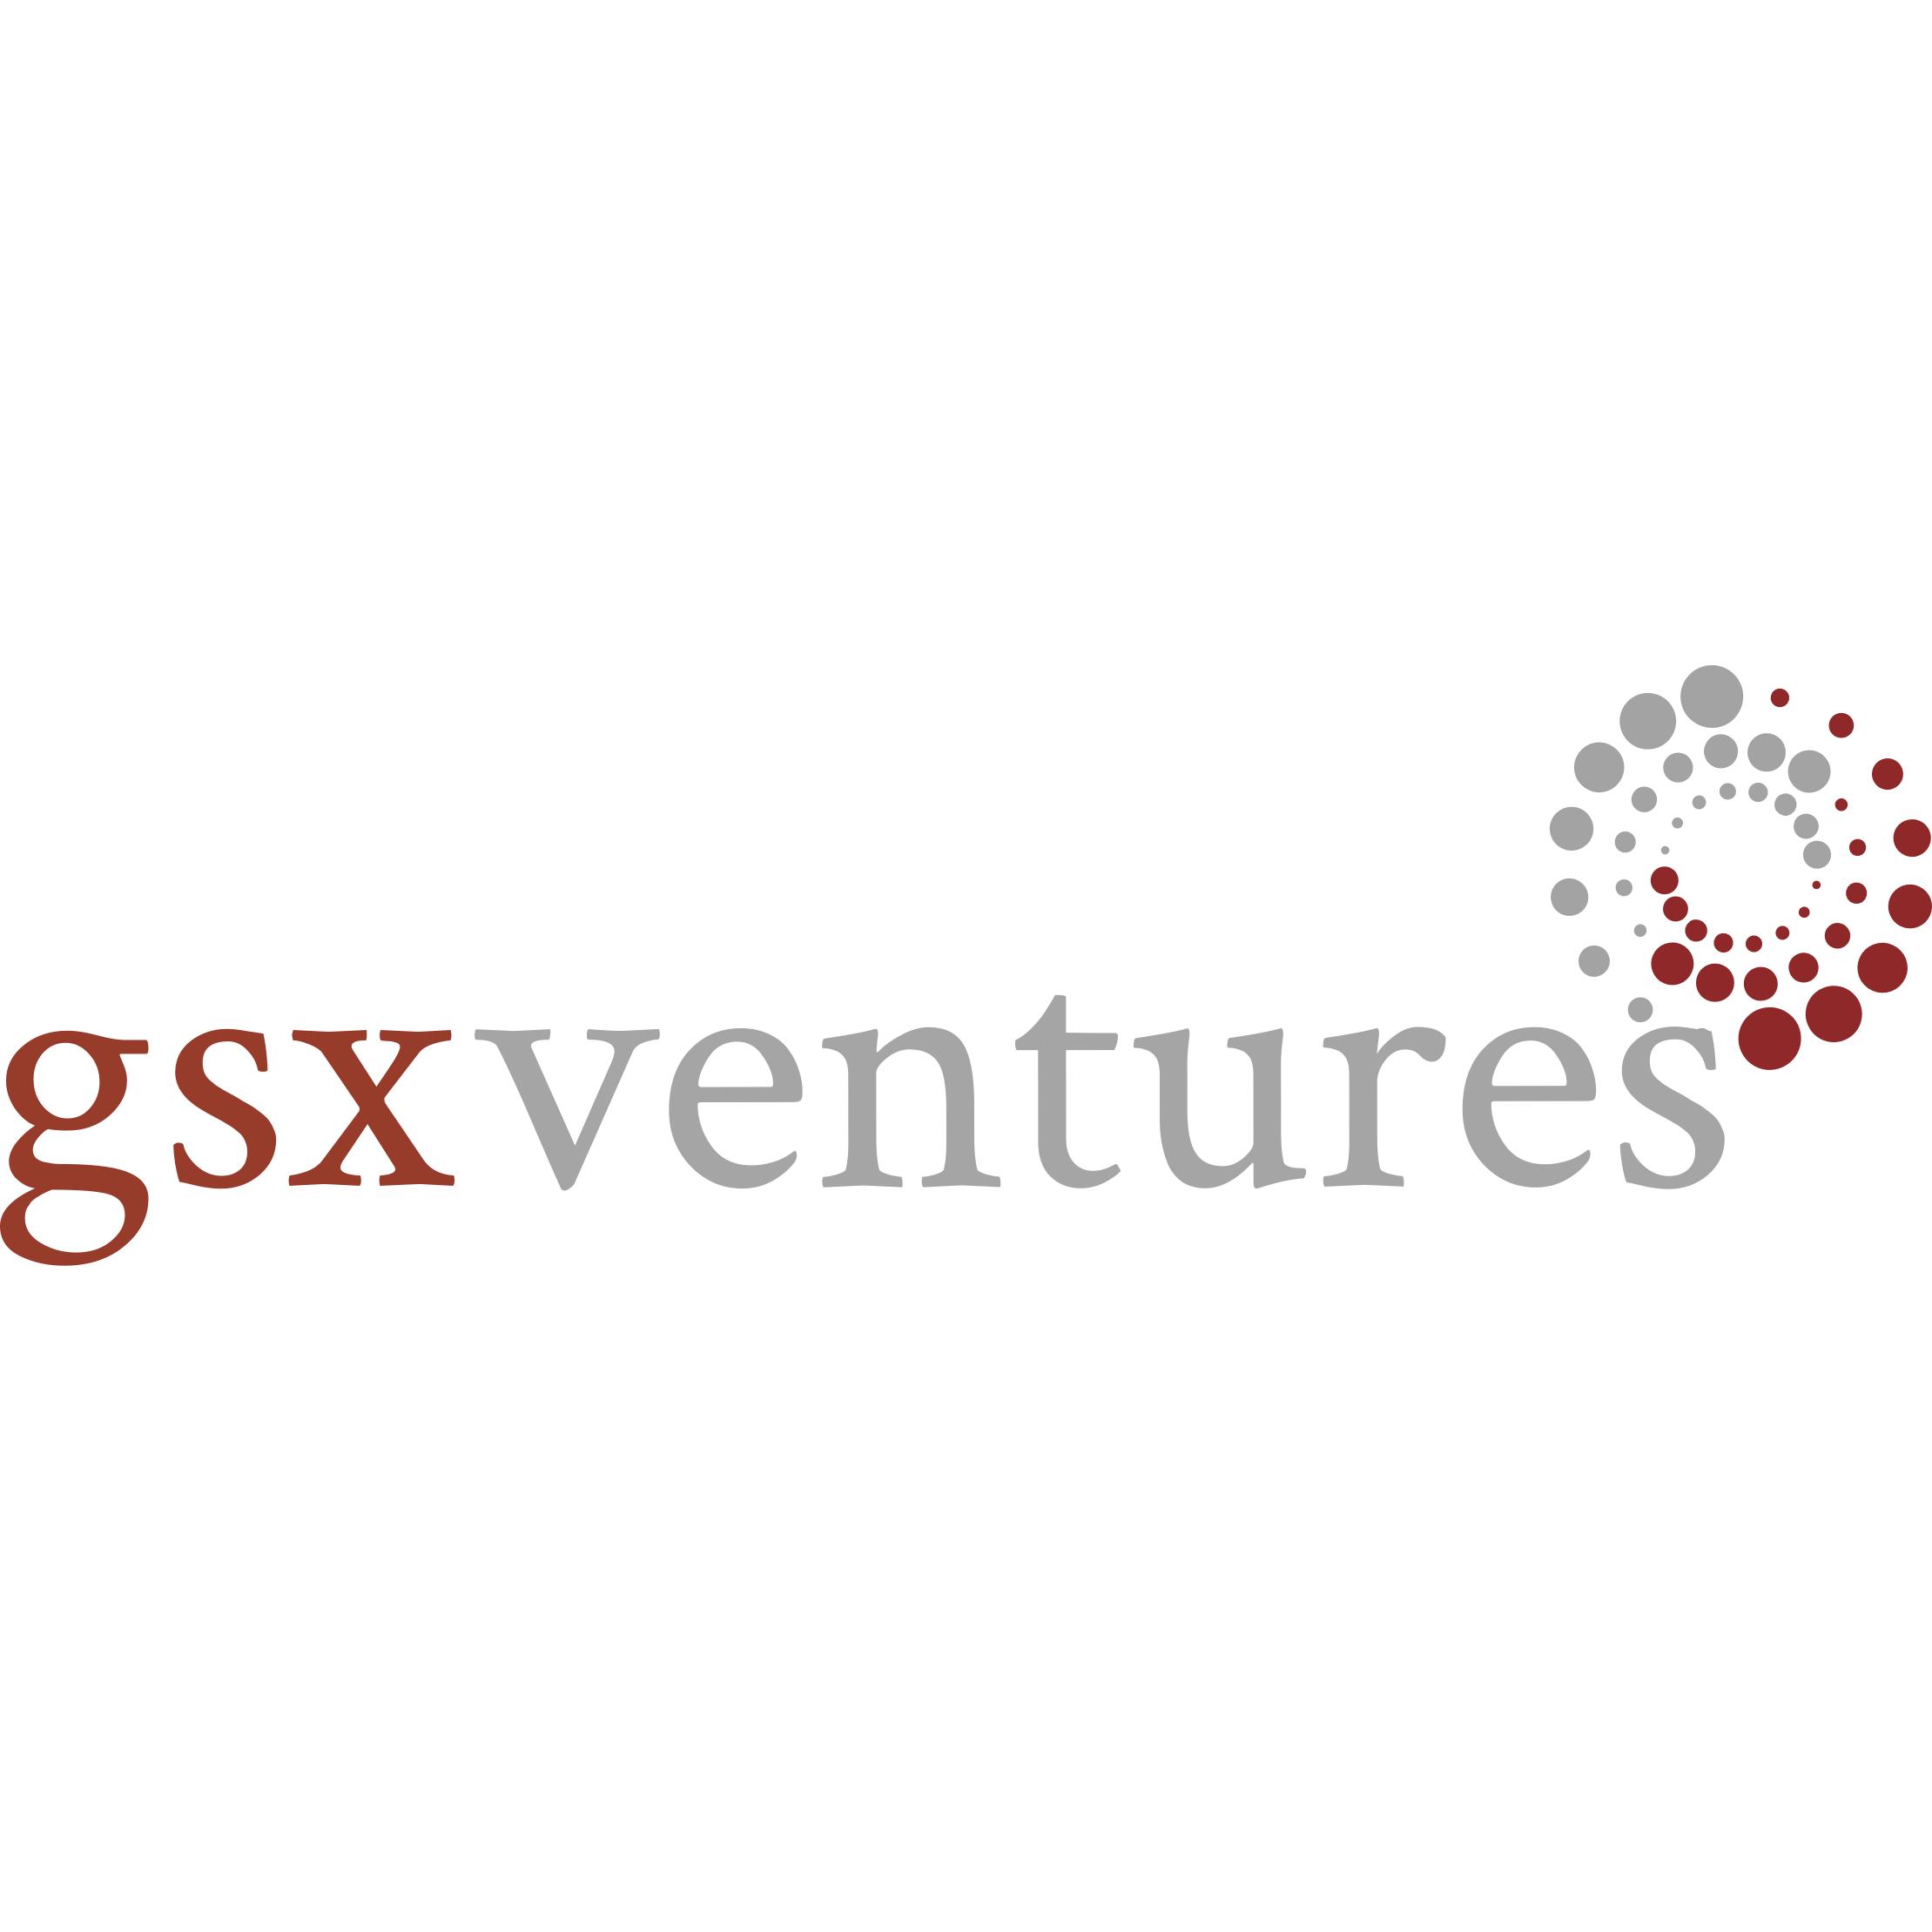 GSX Ventures